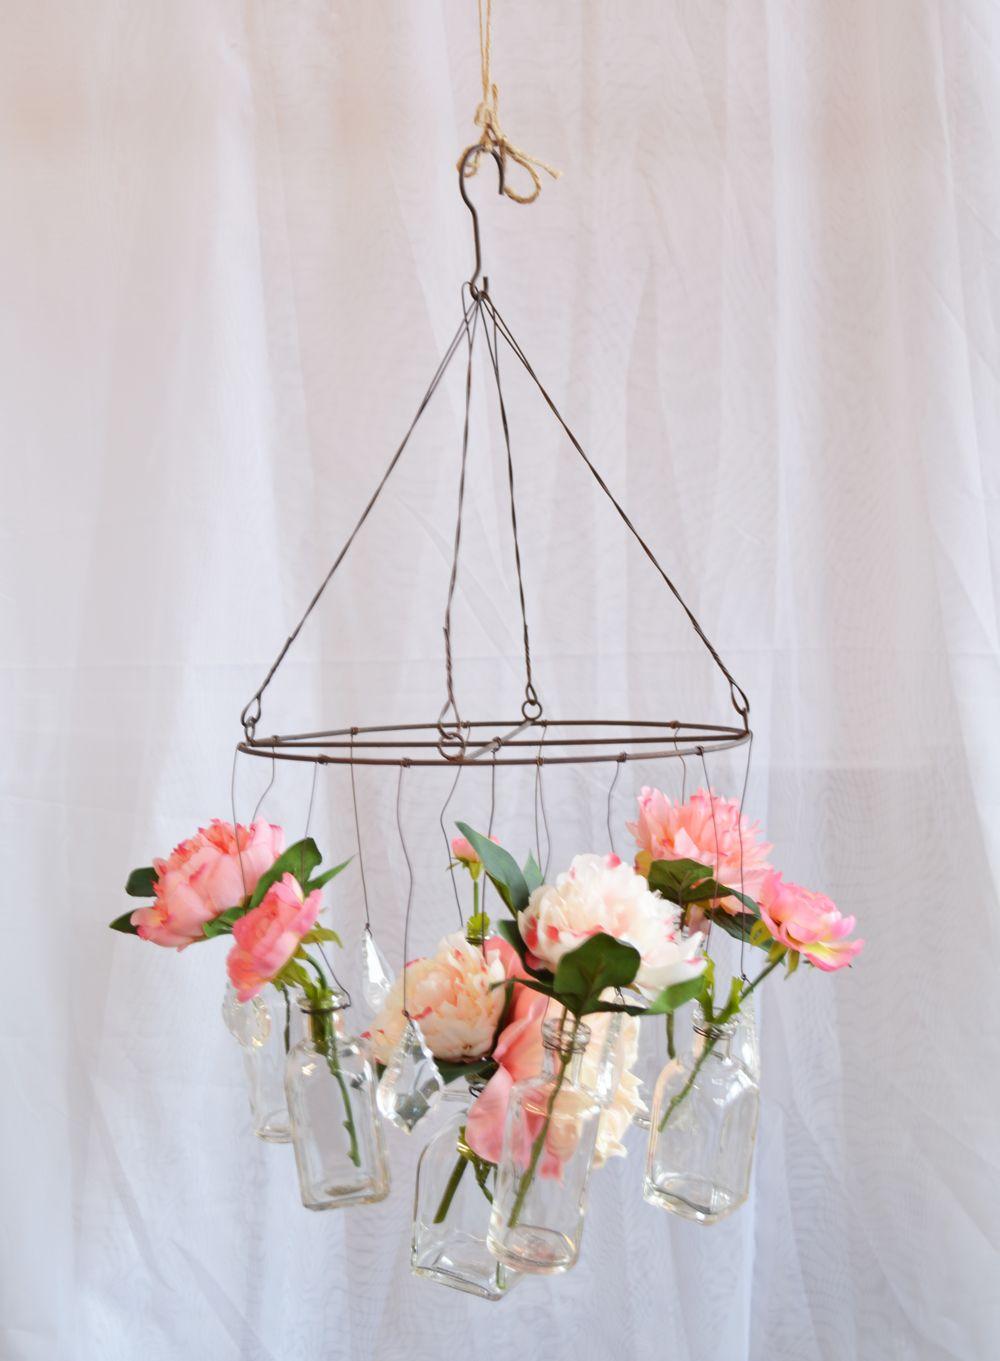 Rustic Glam Wedding Decorations at Afloral.com | Glass Wedding Decor ...